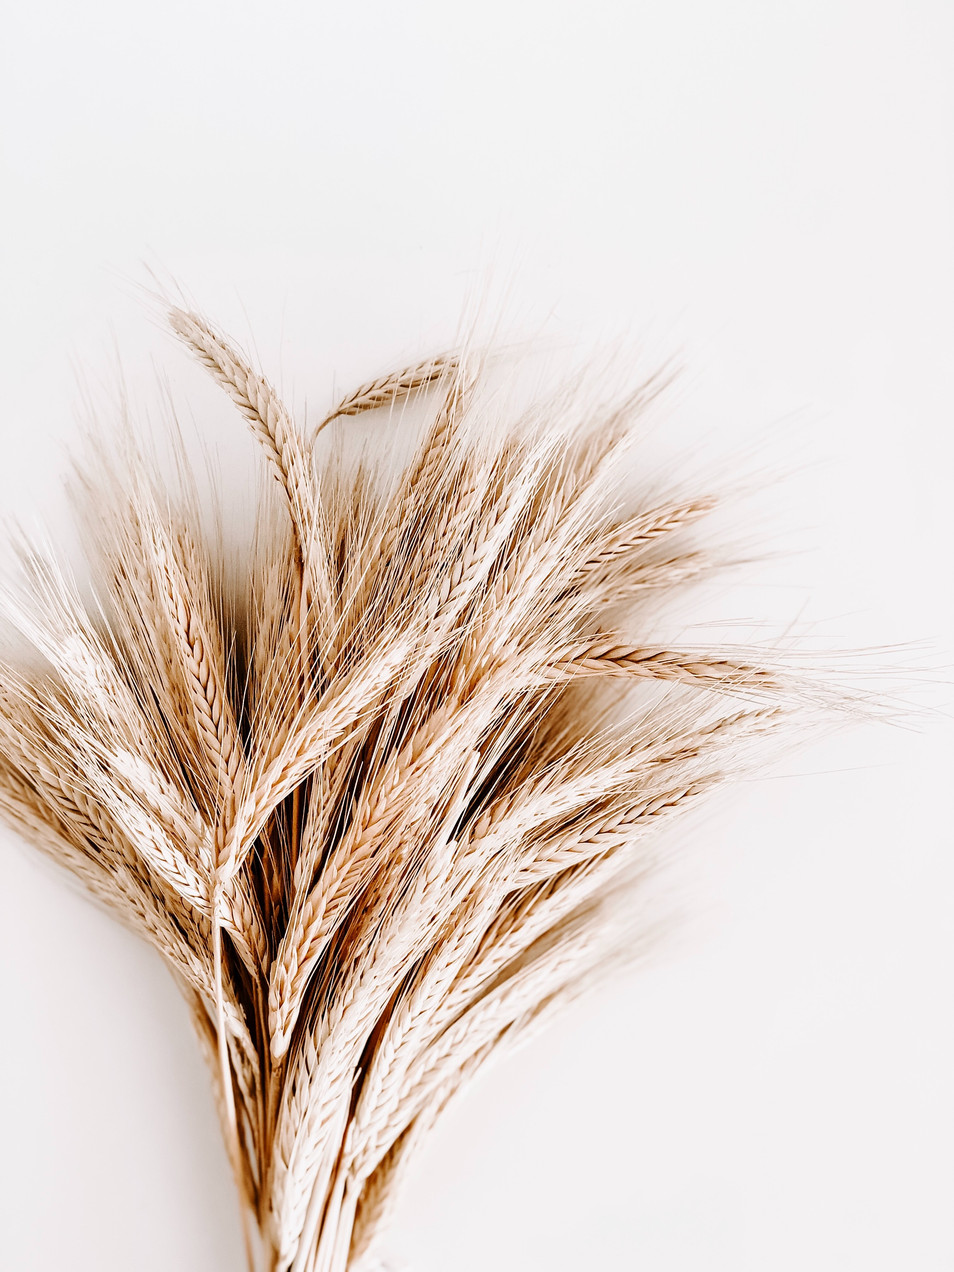 brown-rice-plant-1974627.jpg